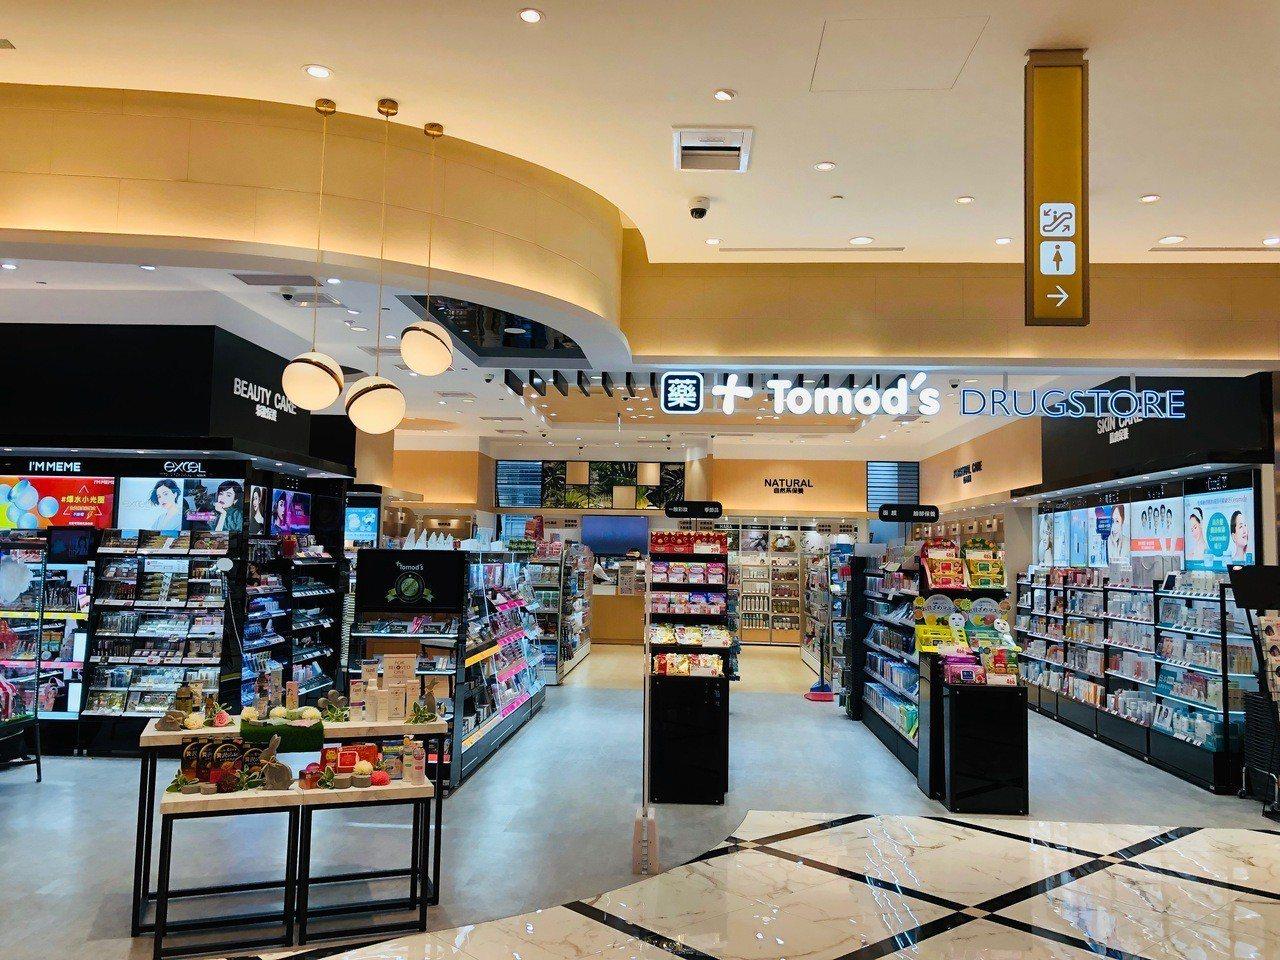 Tomod's打造全台首間特別仕樣店,於微風南山艾妥列商場3樓亮相。圖/Tomo...